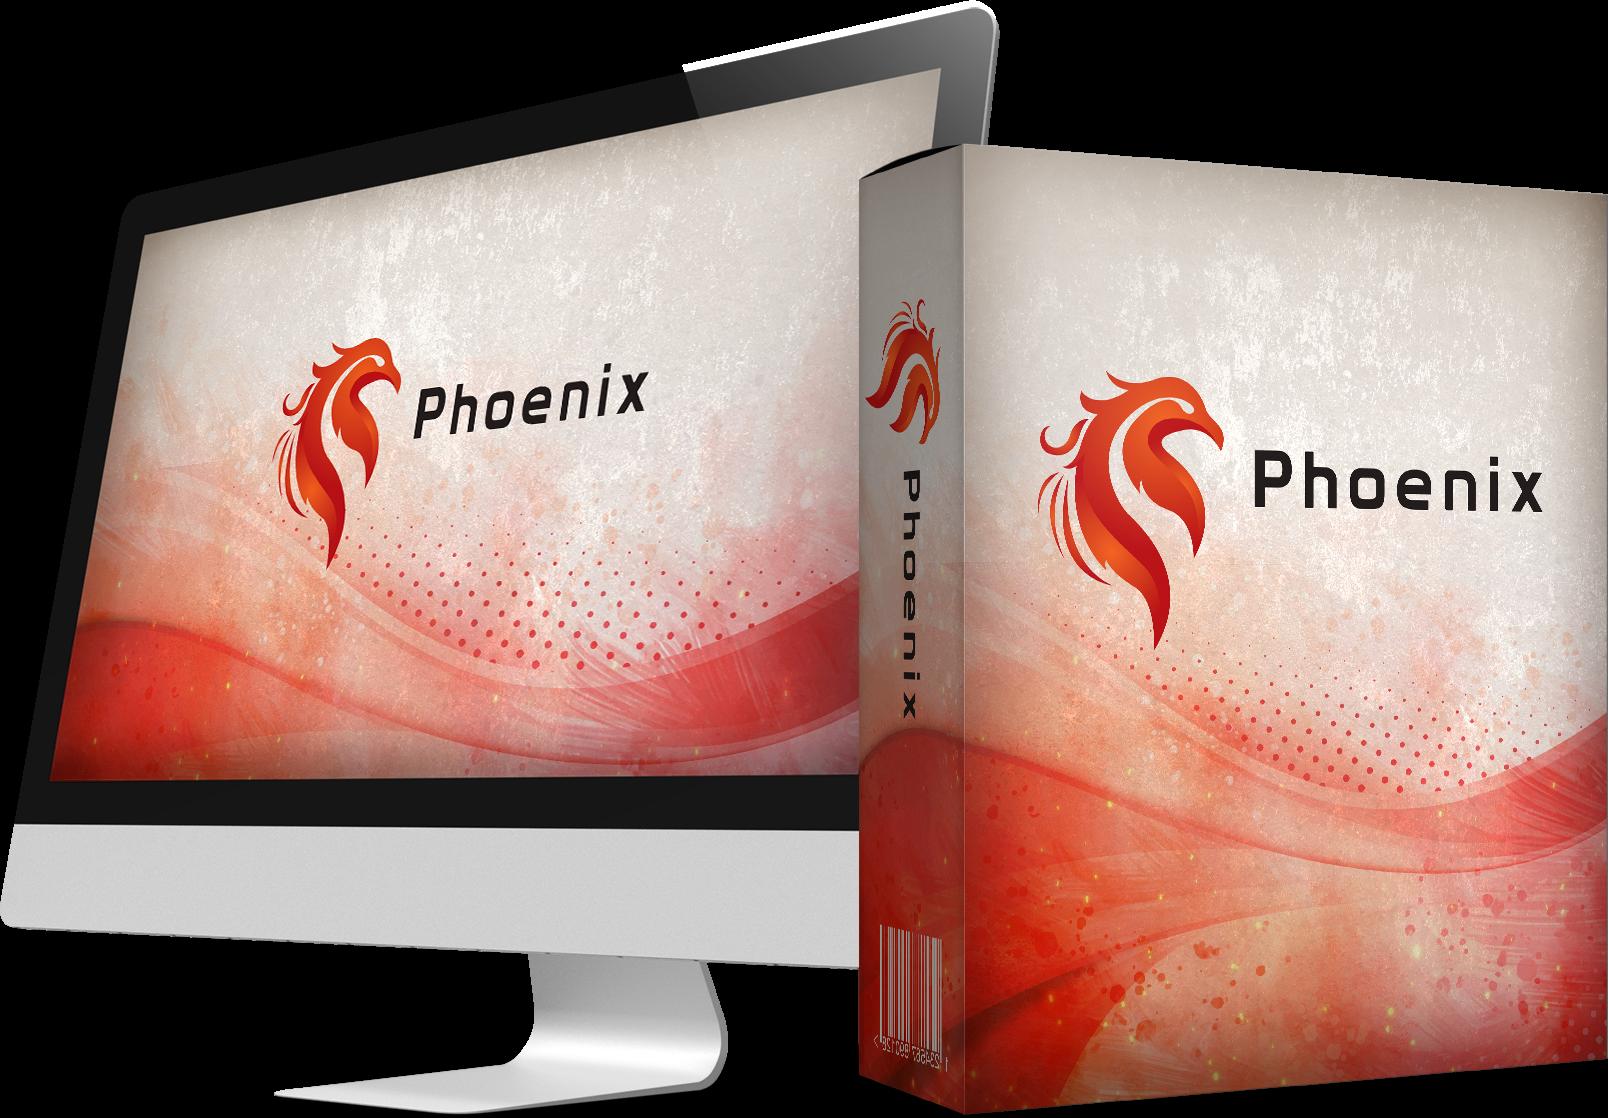 Phoenix Mini Review